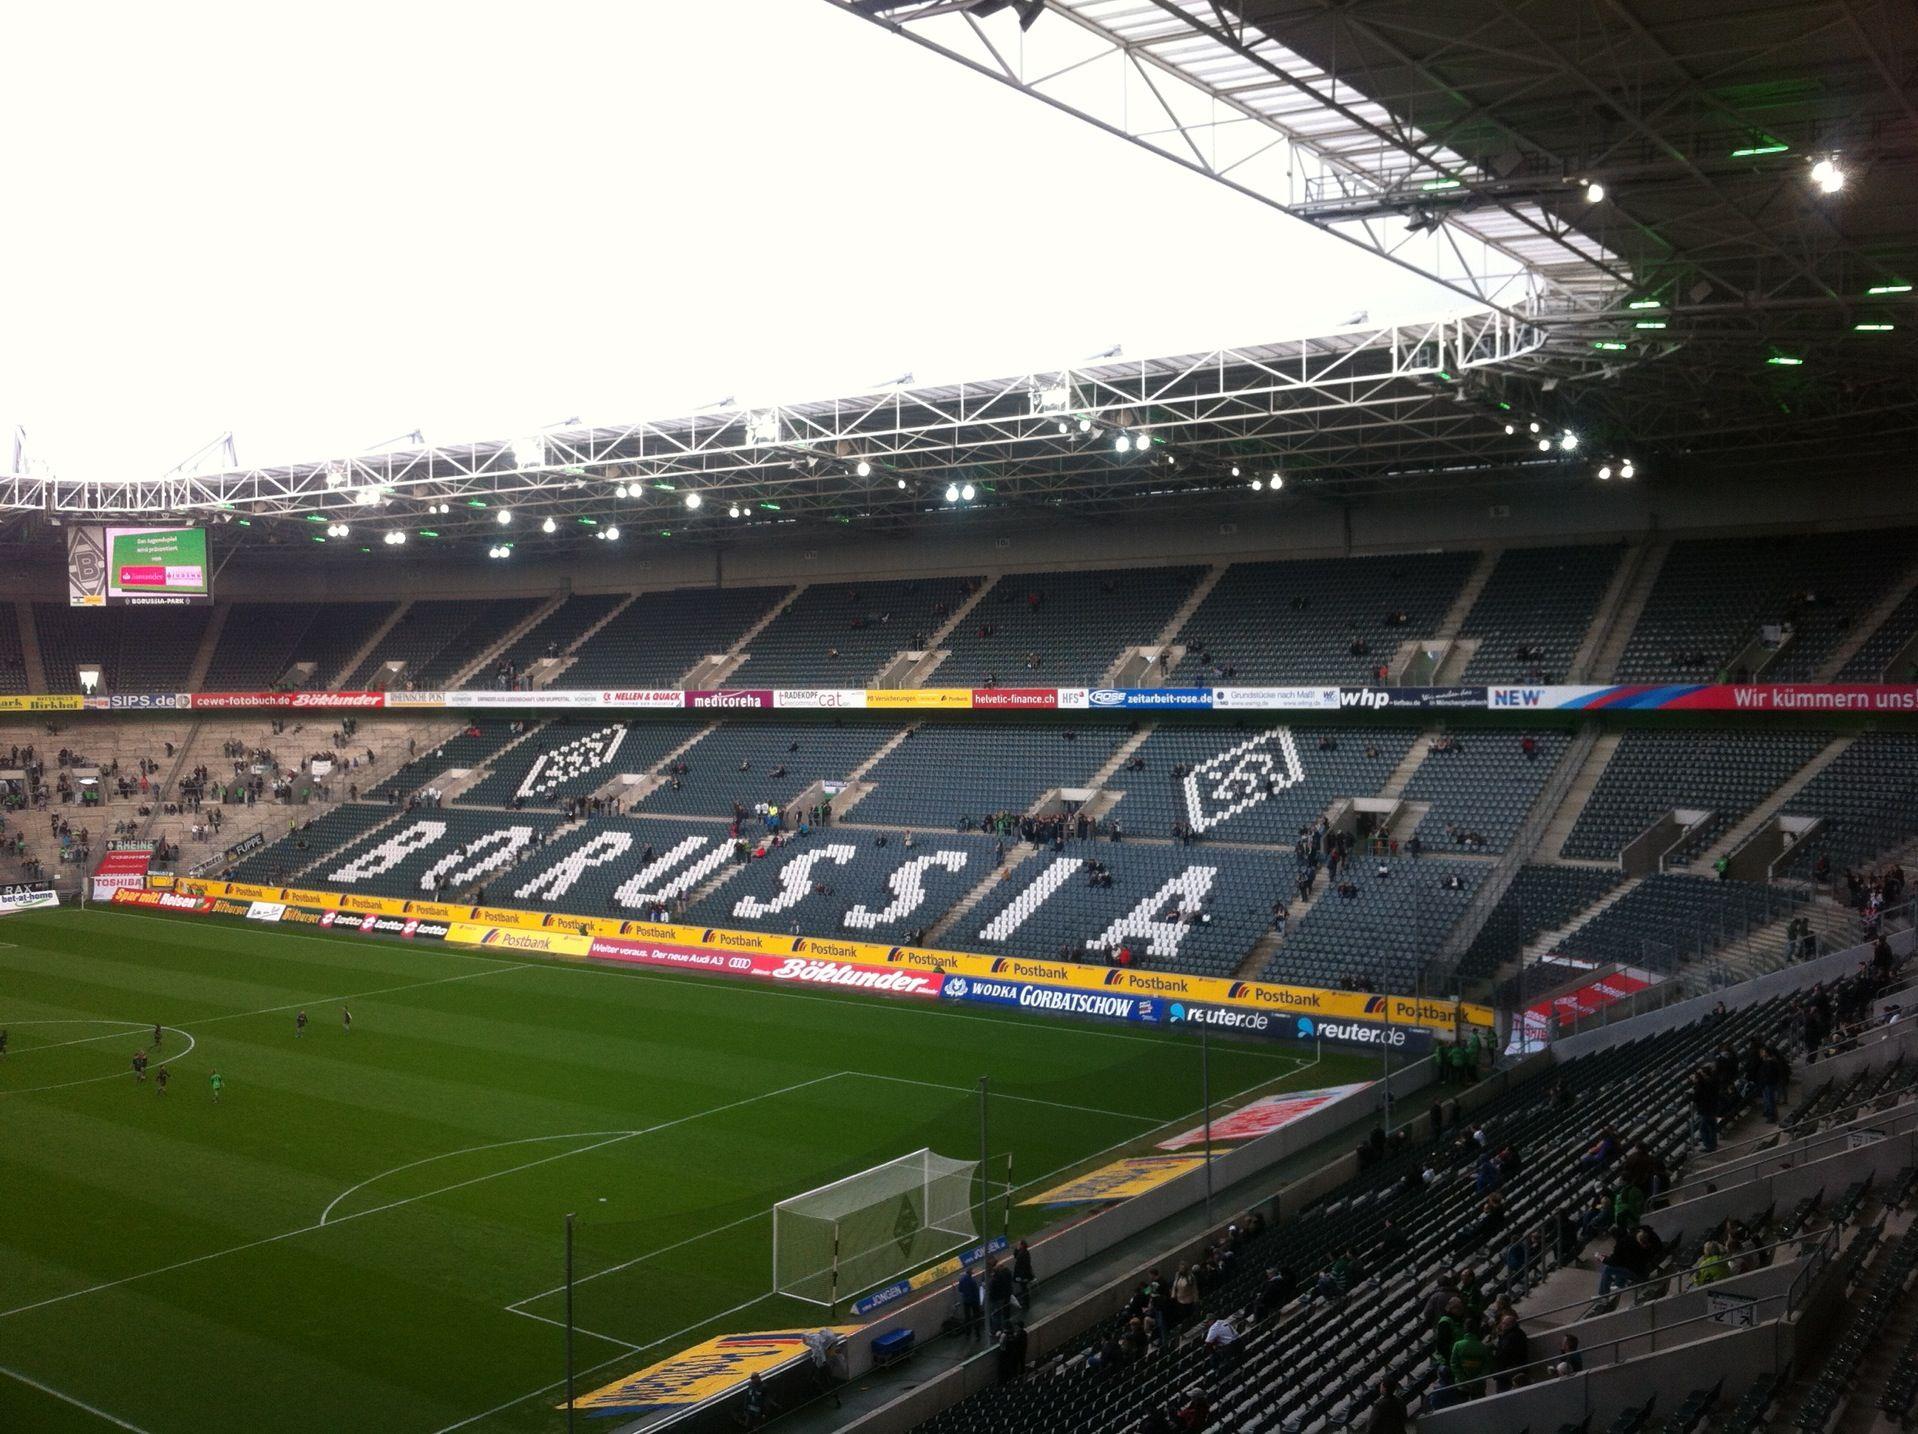 Borussia-Park | Soccer field, Stadium, Life